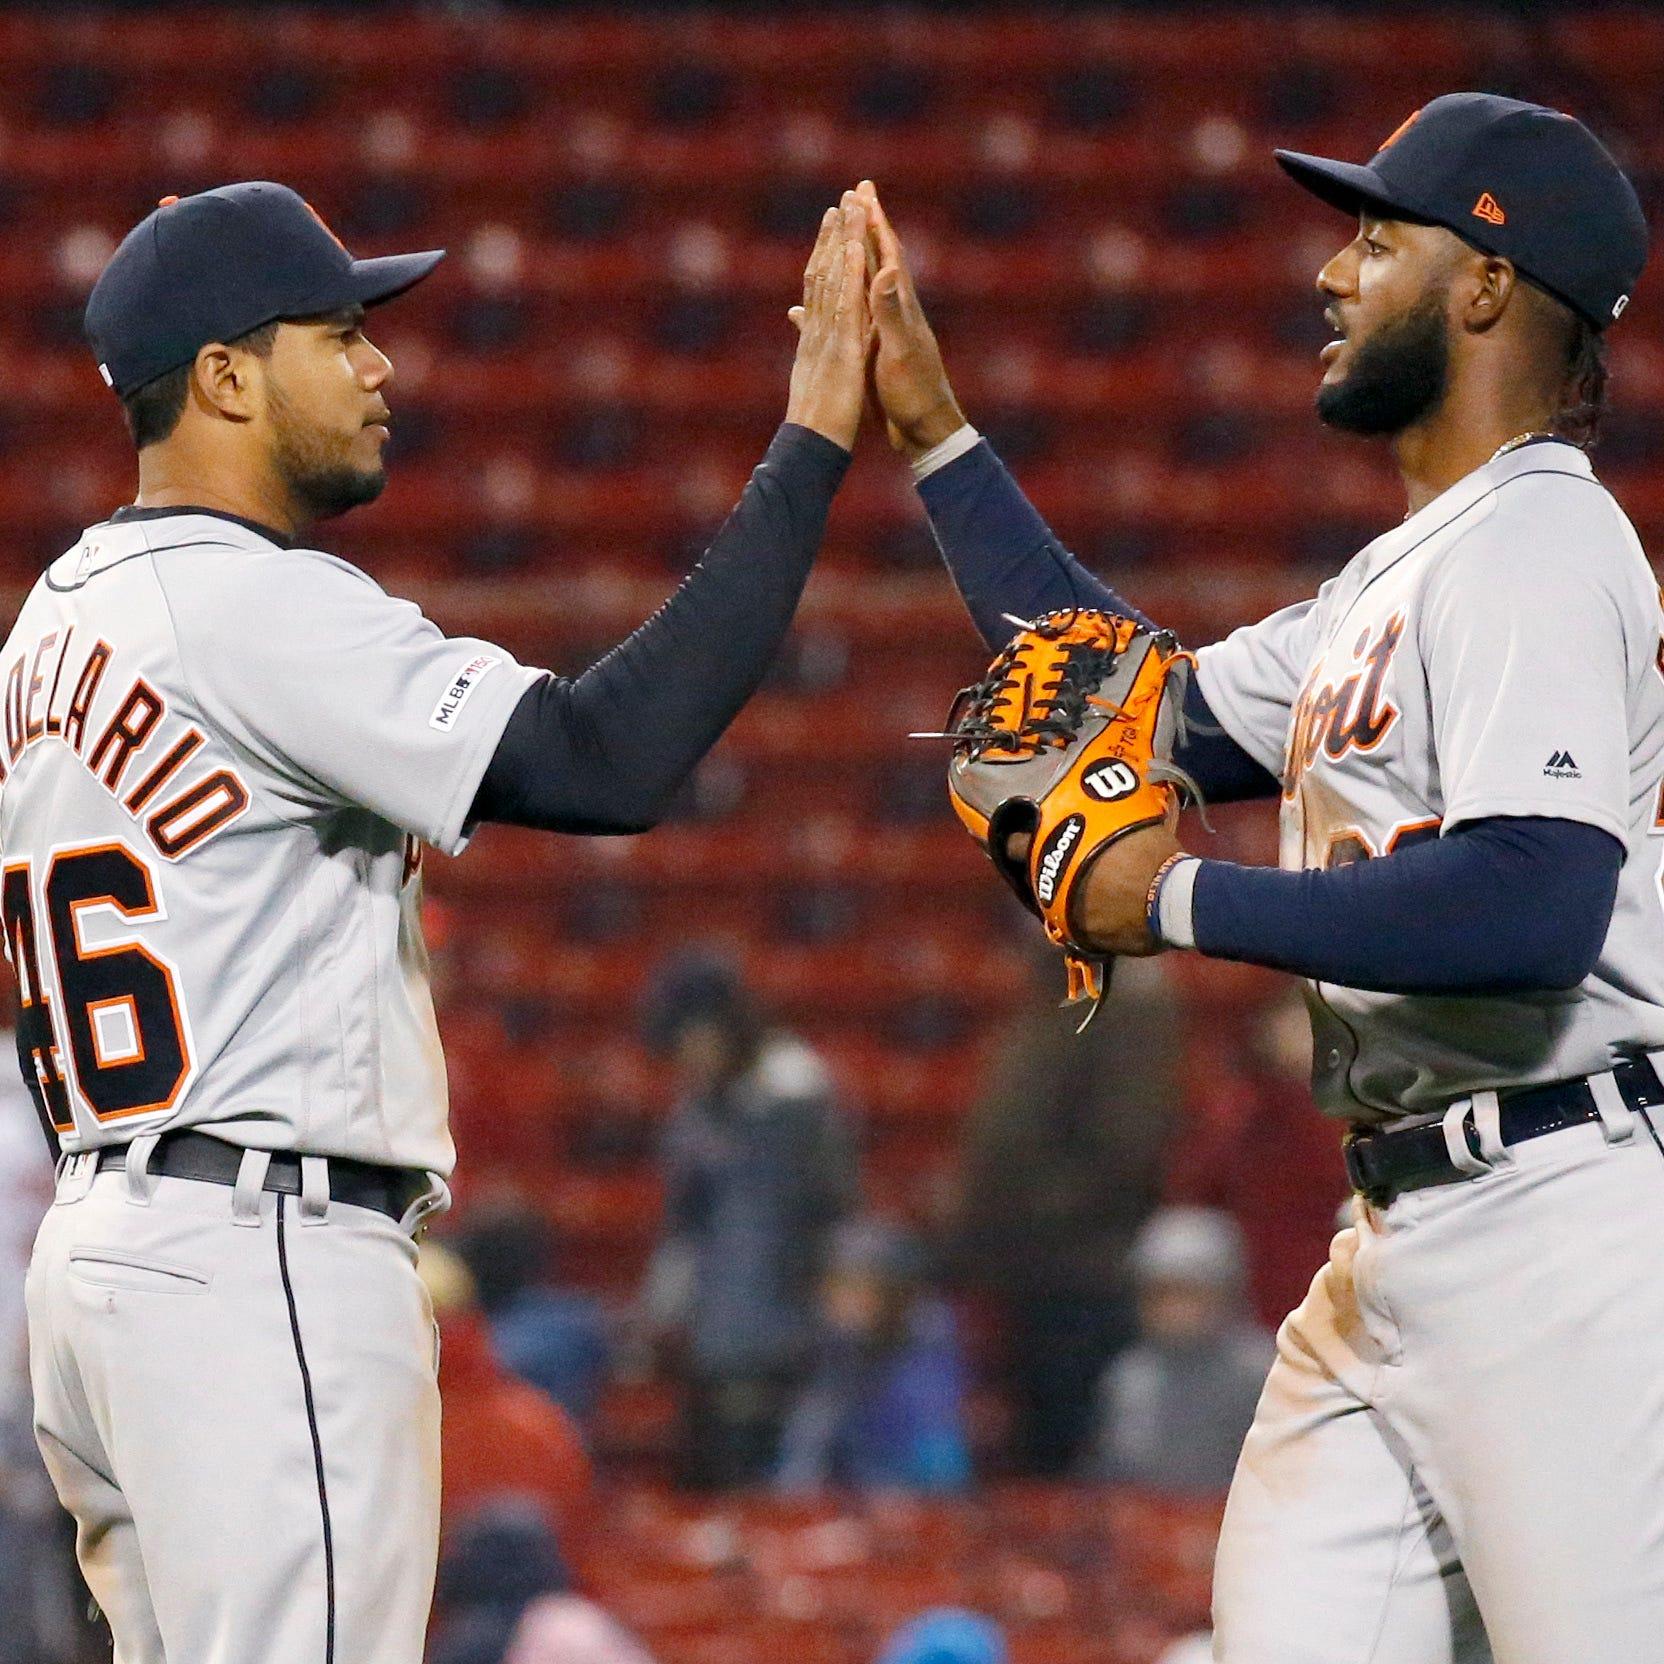 Brandon Dixon, gritty bullpen help Tigers complete doubleheader sweep